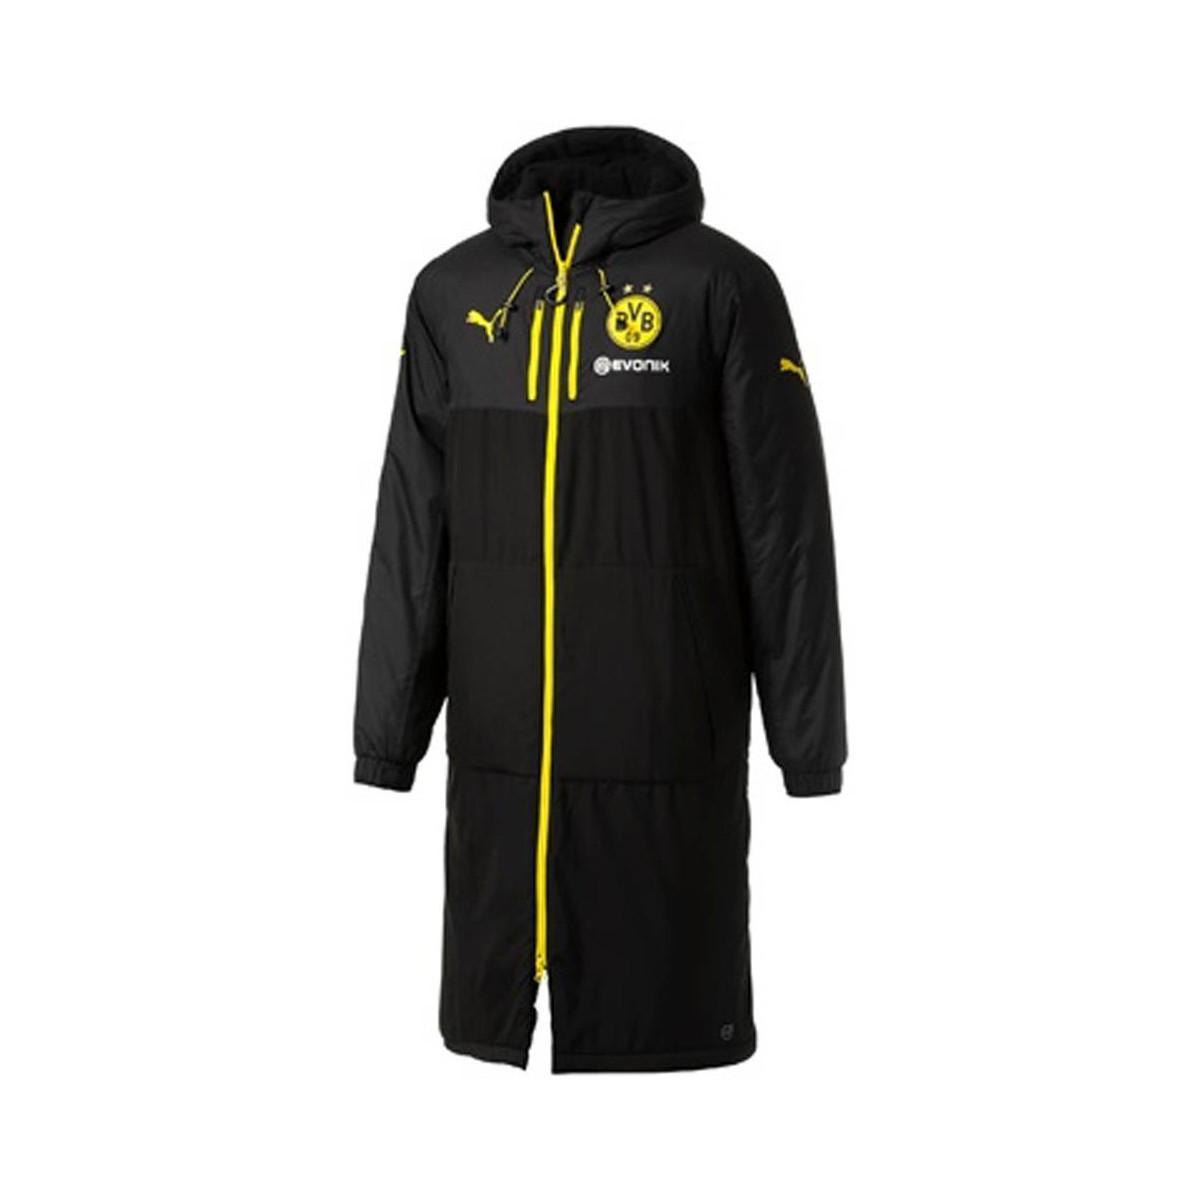 d154cd4f73da PUMA 2017-2018 Borussia Dortmund Long Bench Jacket Men s Jacket In ...